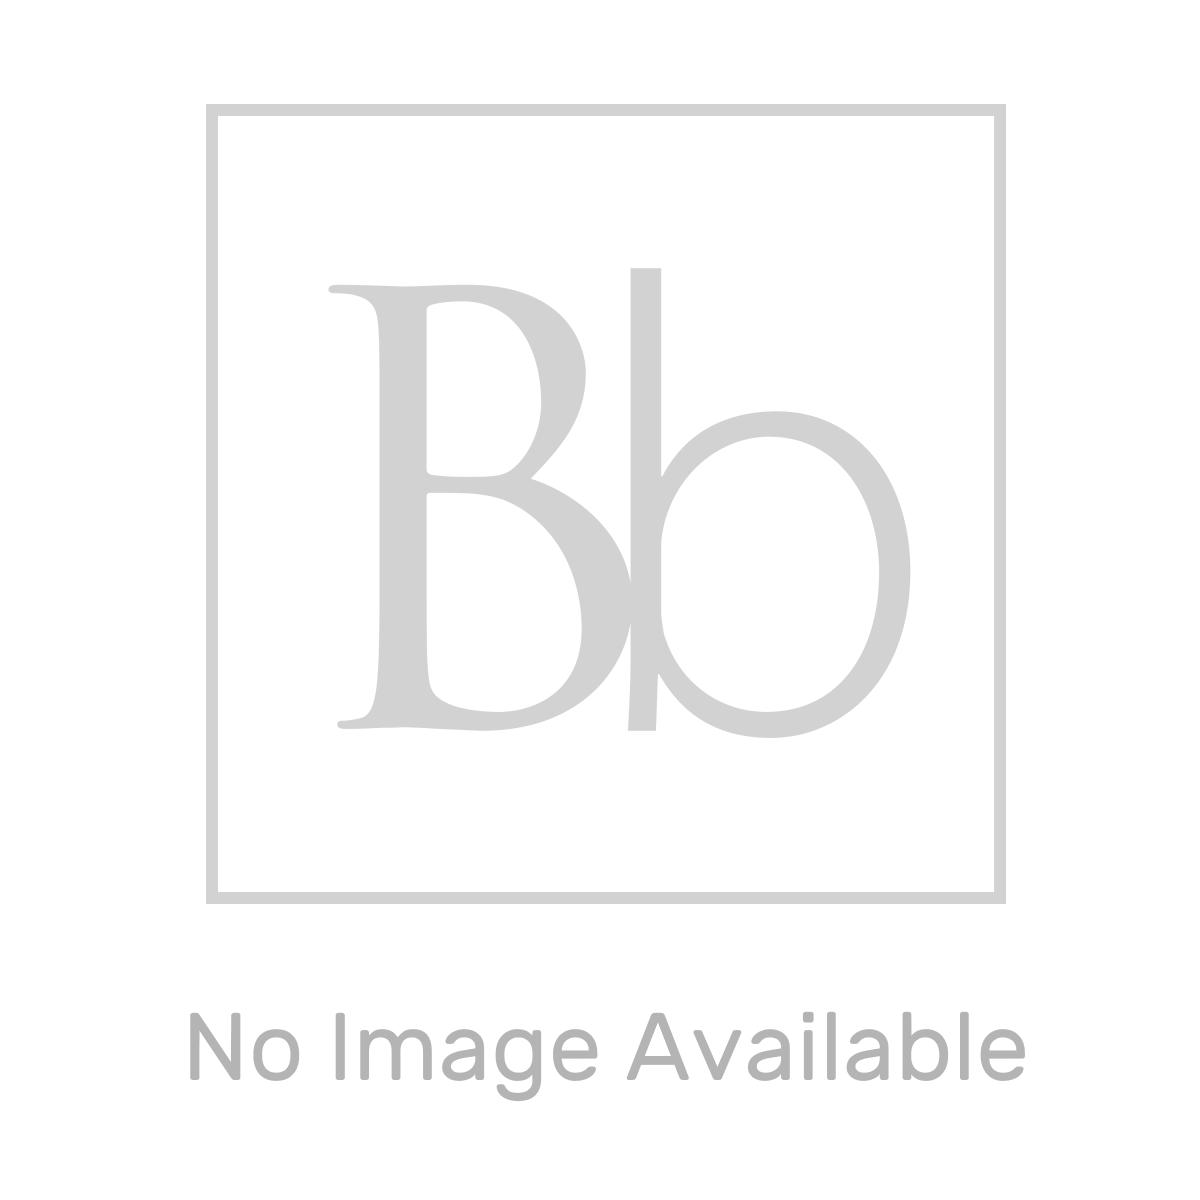 RAK Cubis Black Double Wall Mounted Tumbler Measurements